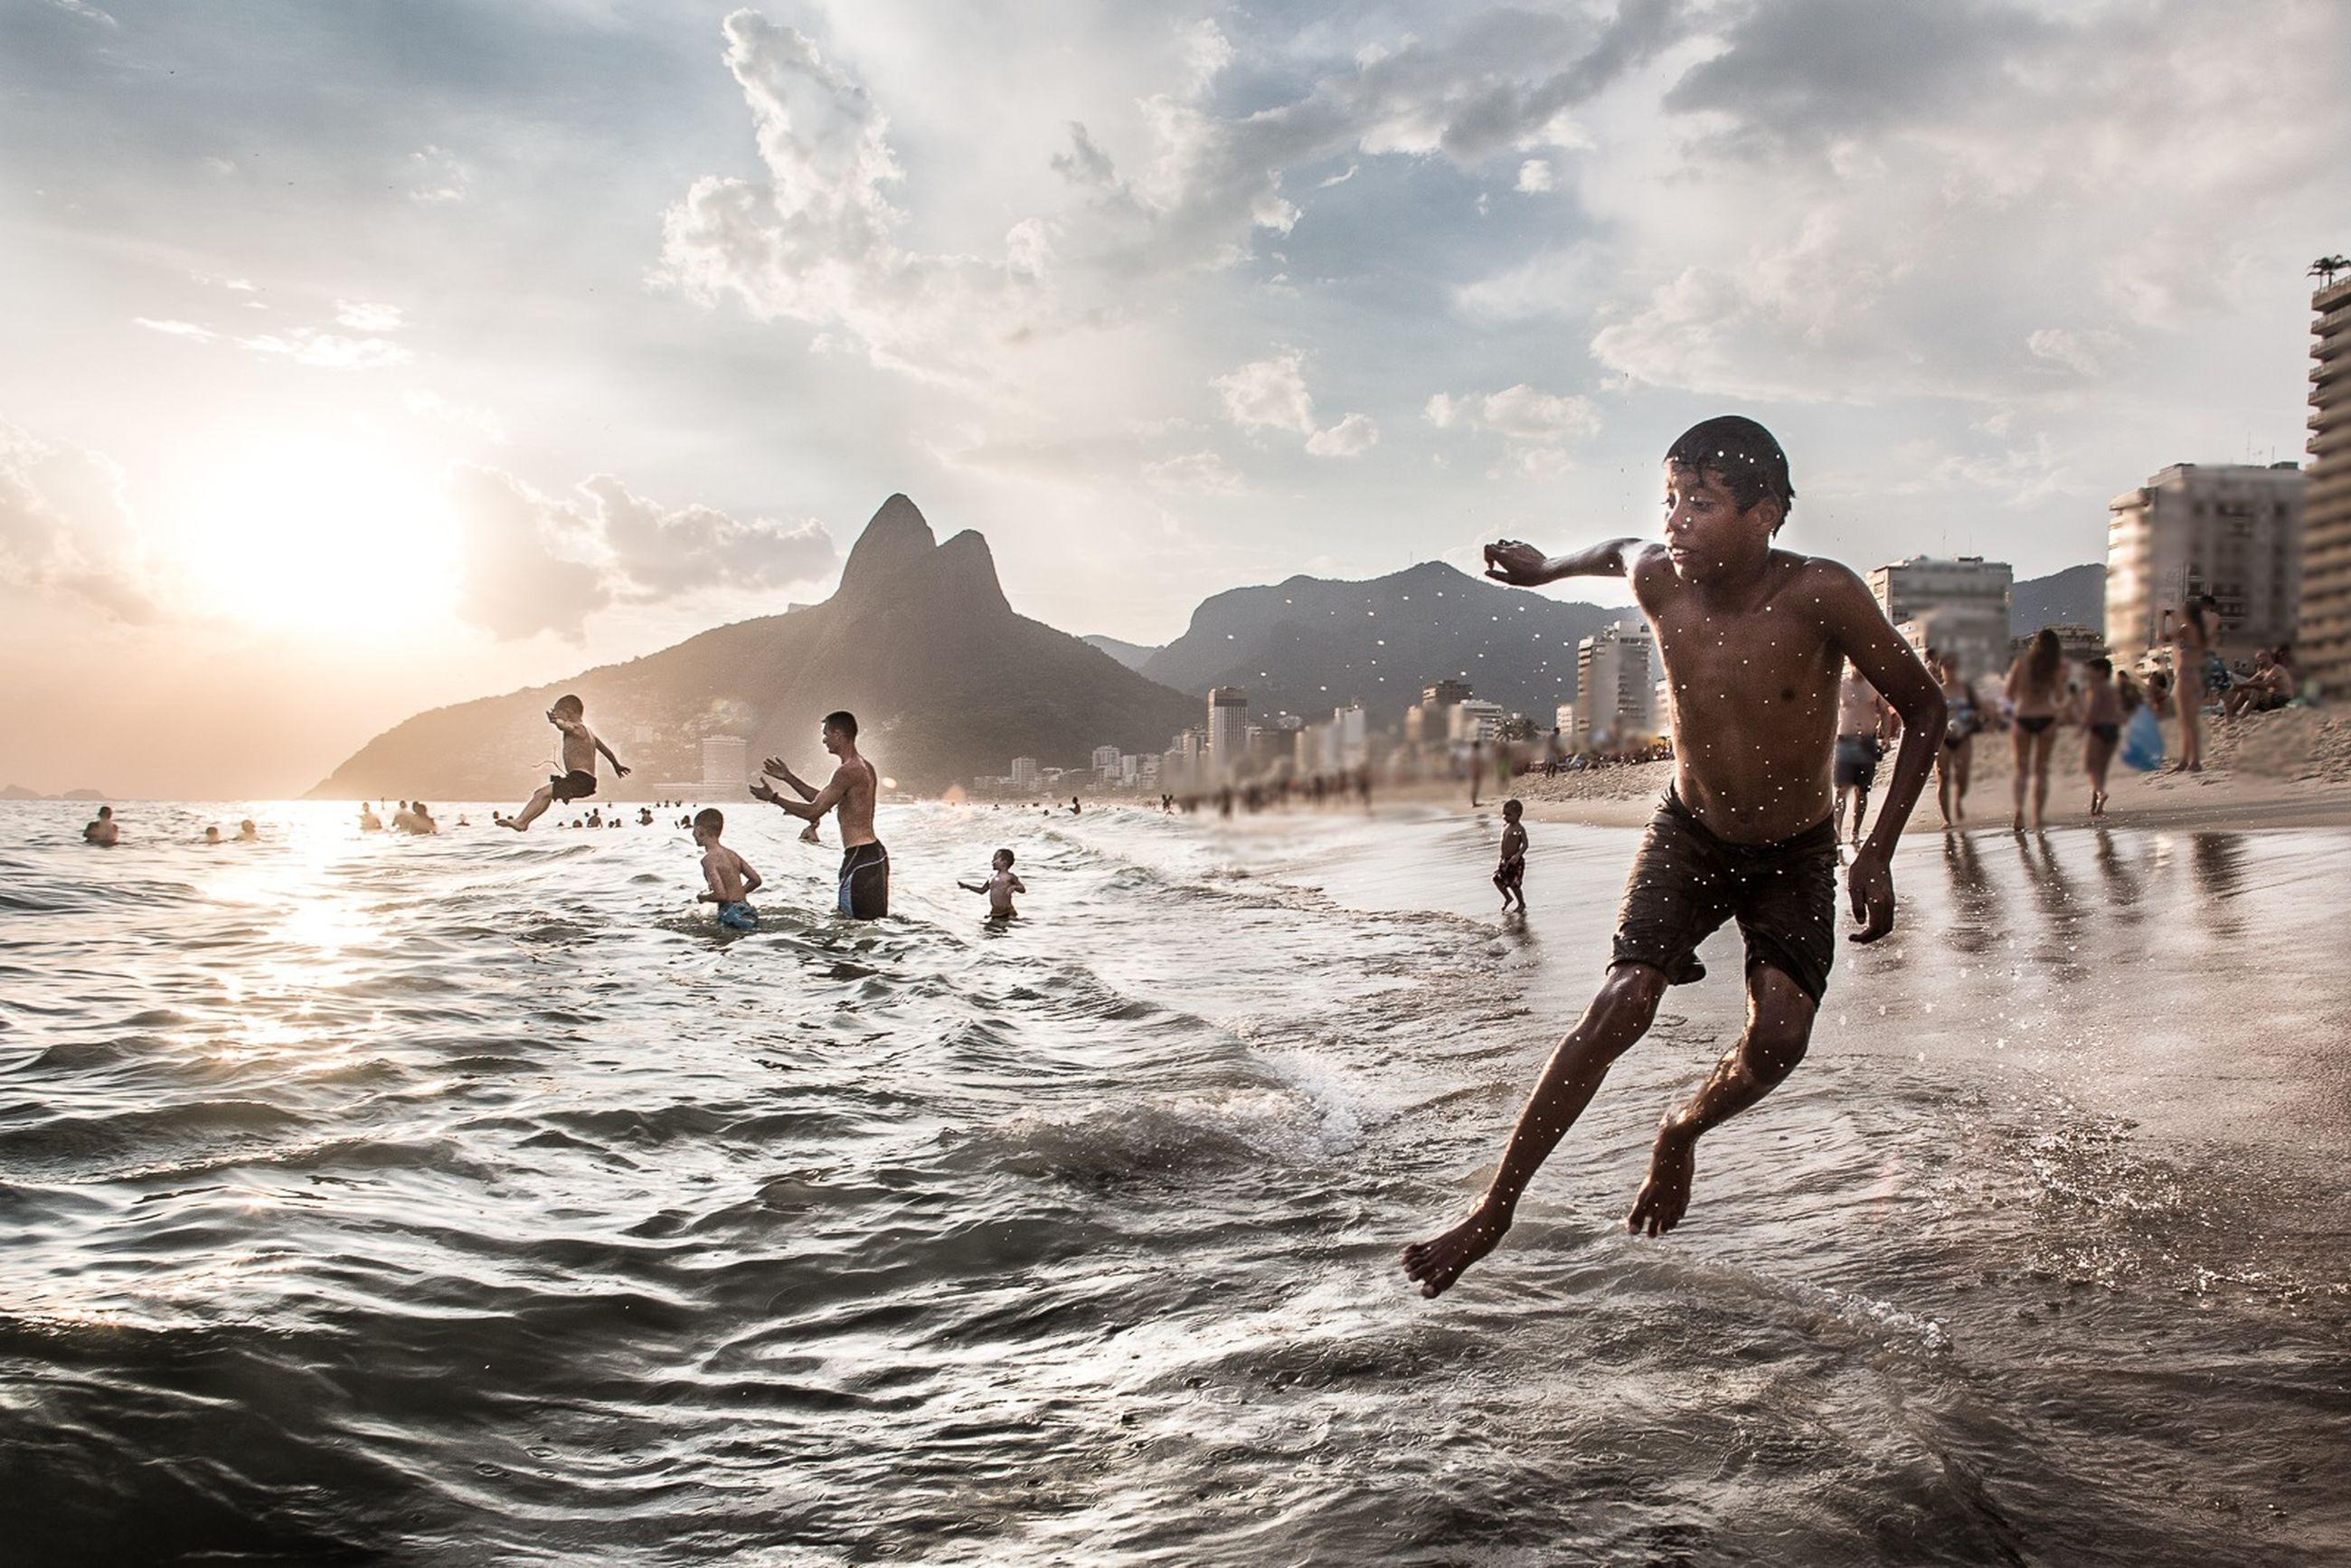 water, lifestyles, leisure activity, sea, sky, vacations, men, beach, enjoyment, full length, sunlight, waterfront, cloud - sky, tourist, wave, fun, weekend activities, travel